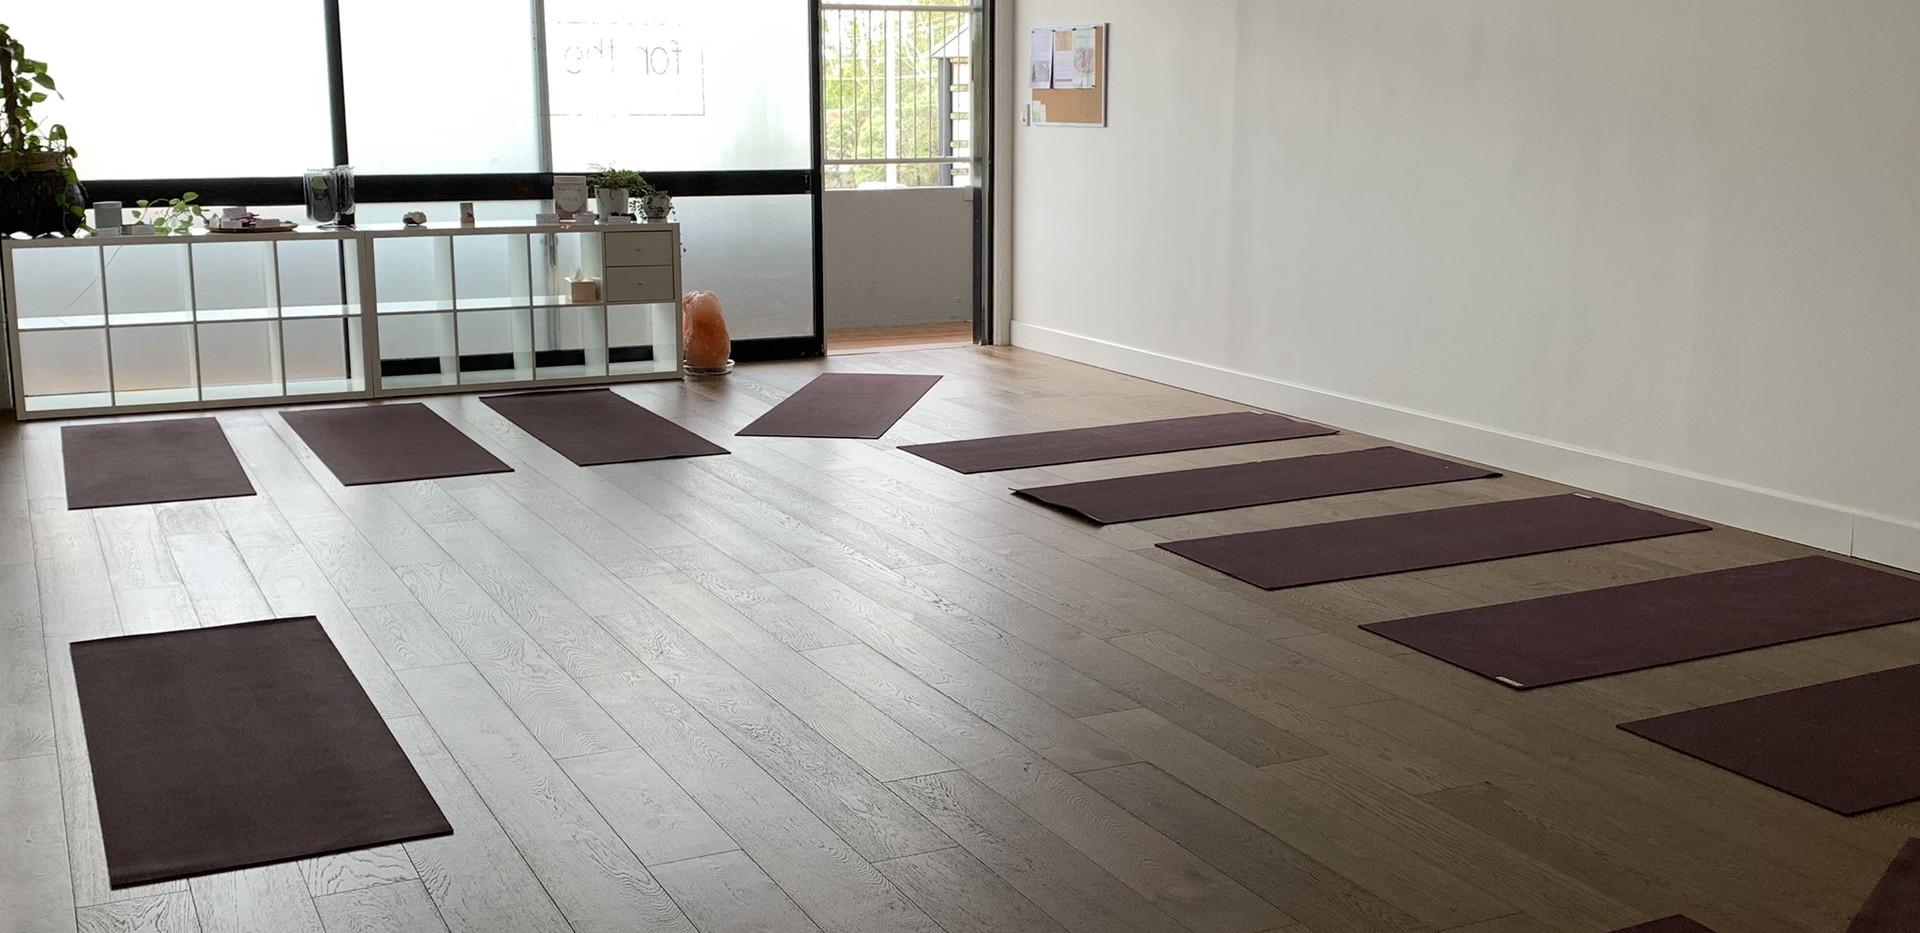 For the Folk Yoga and Wellness